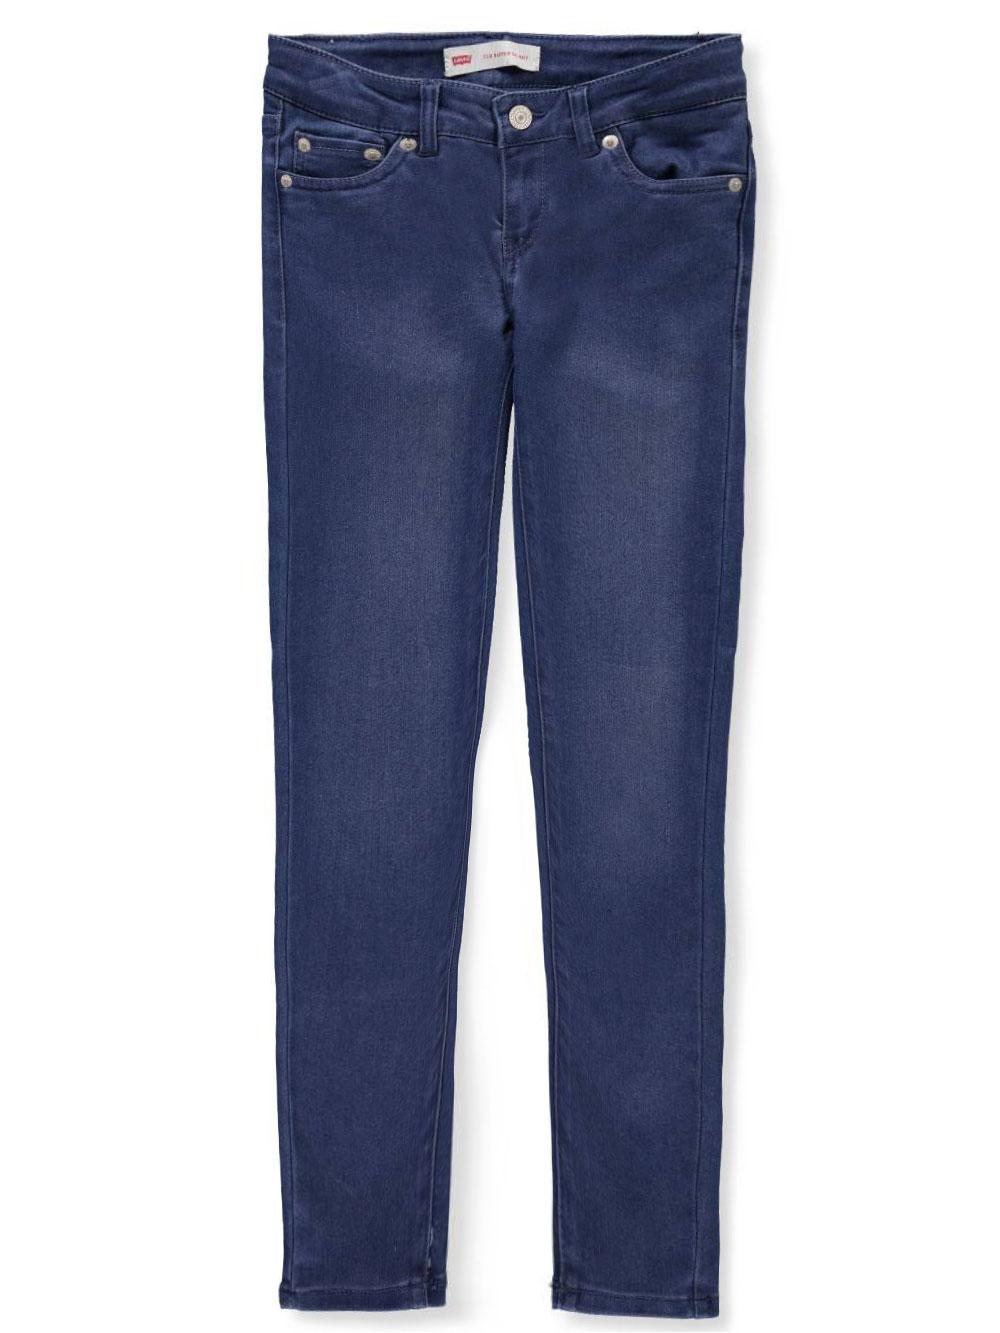 bd9b73e73c1 Levi s Girls  710 Super Skinny Jeans